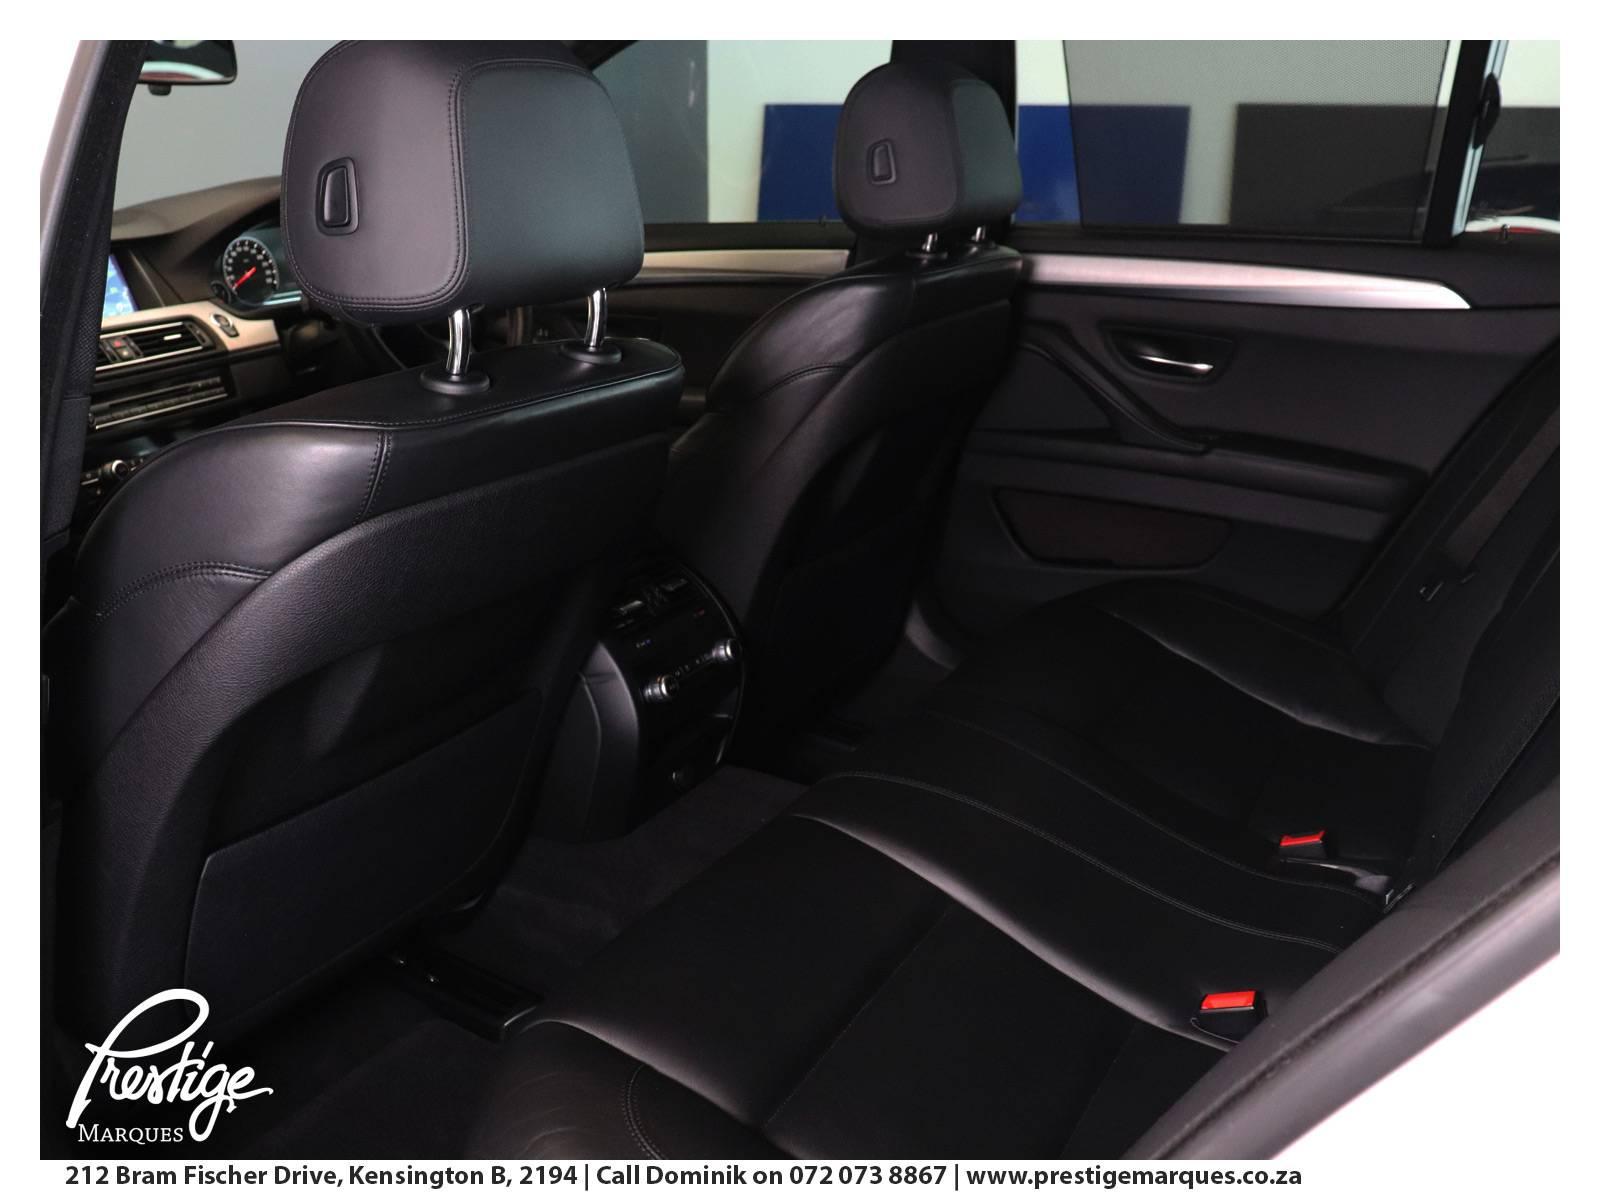 2015-BMW-F10-M5-MDCT-Prestige-Marques-Randburg-Sandton-15